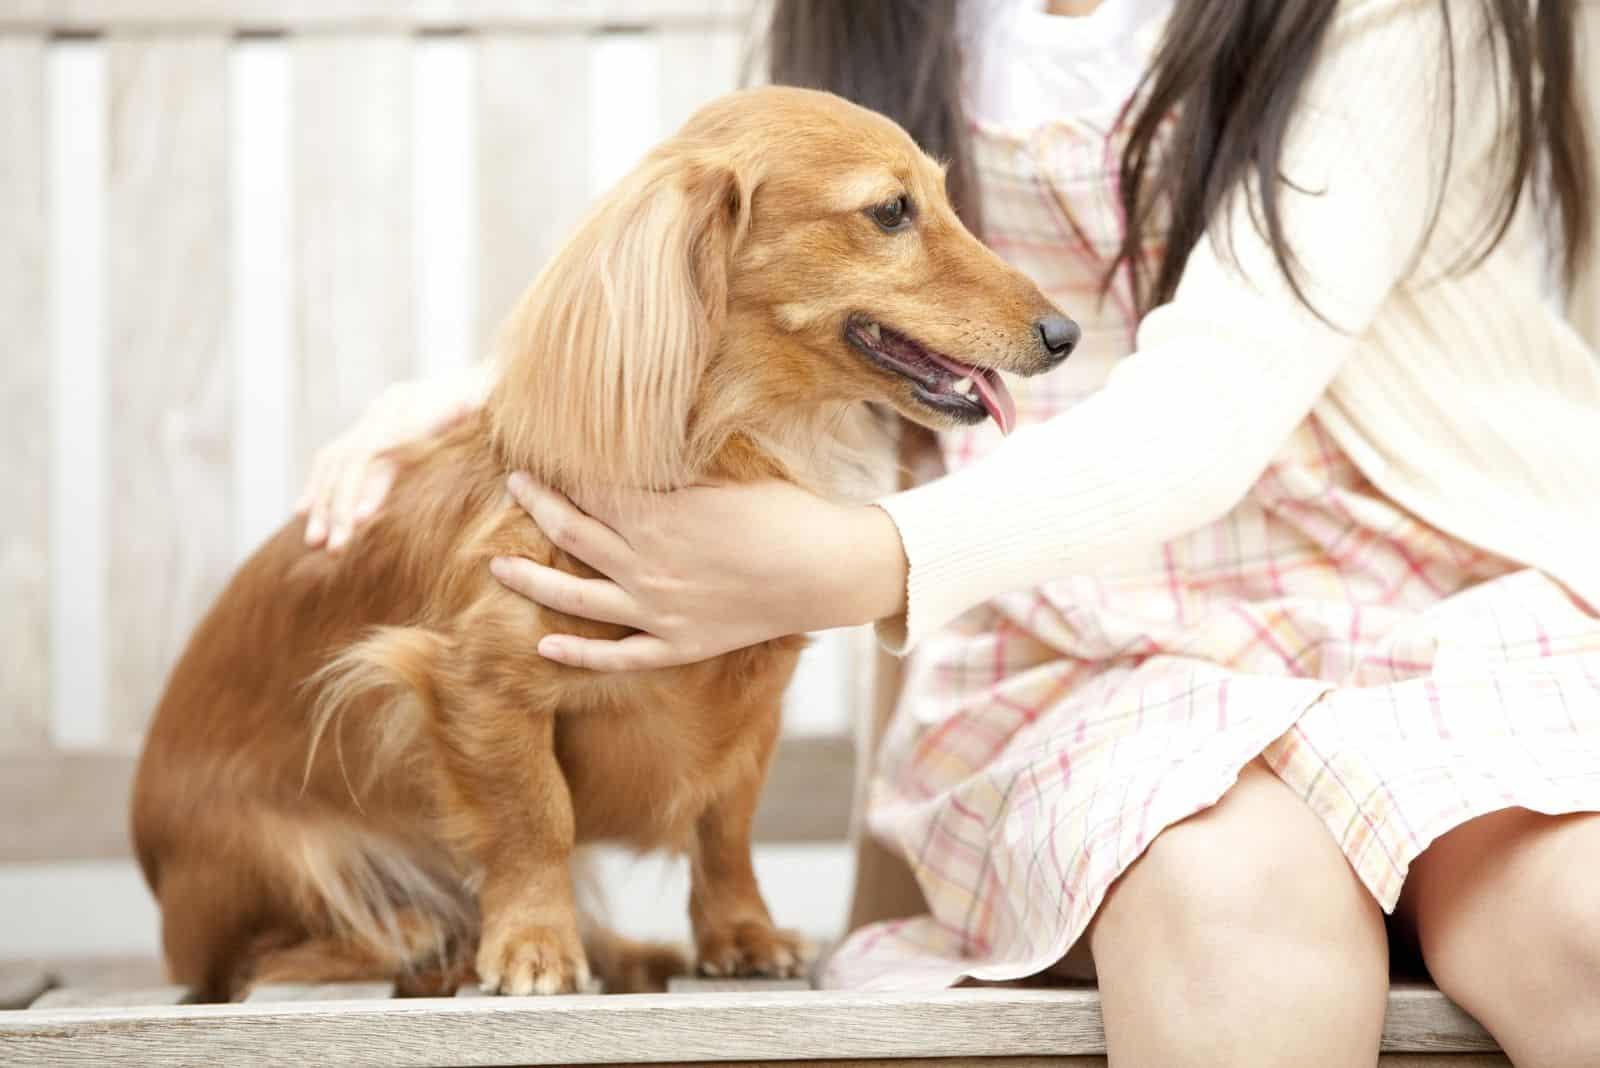 miniature long hair dachshund pet by a little girl